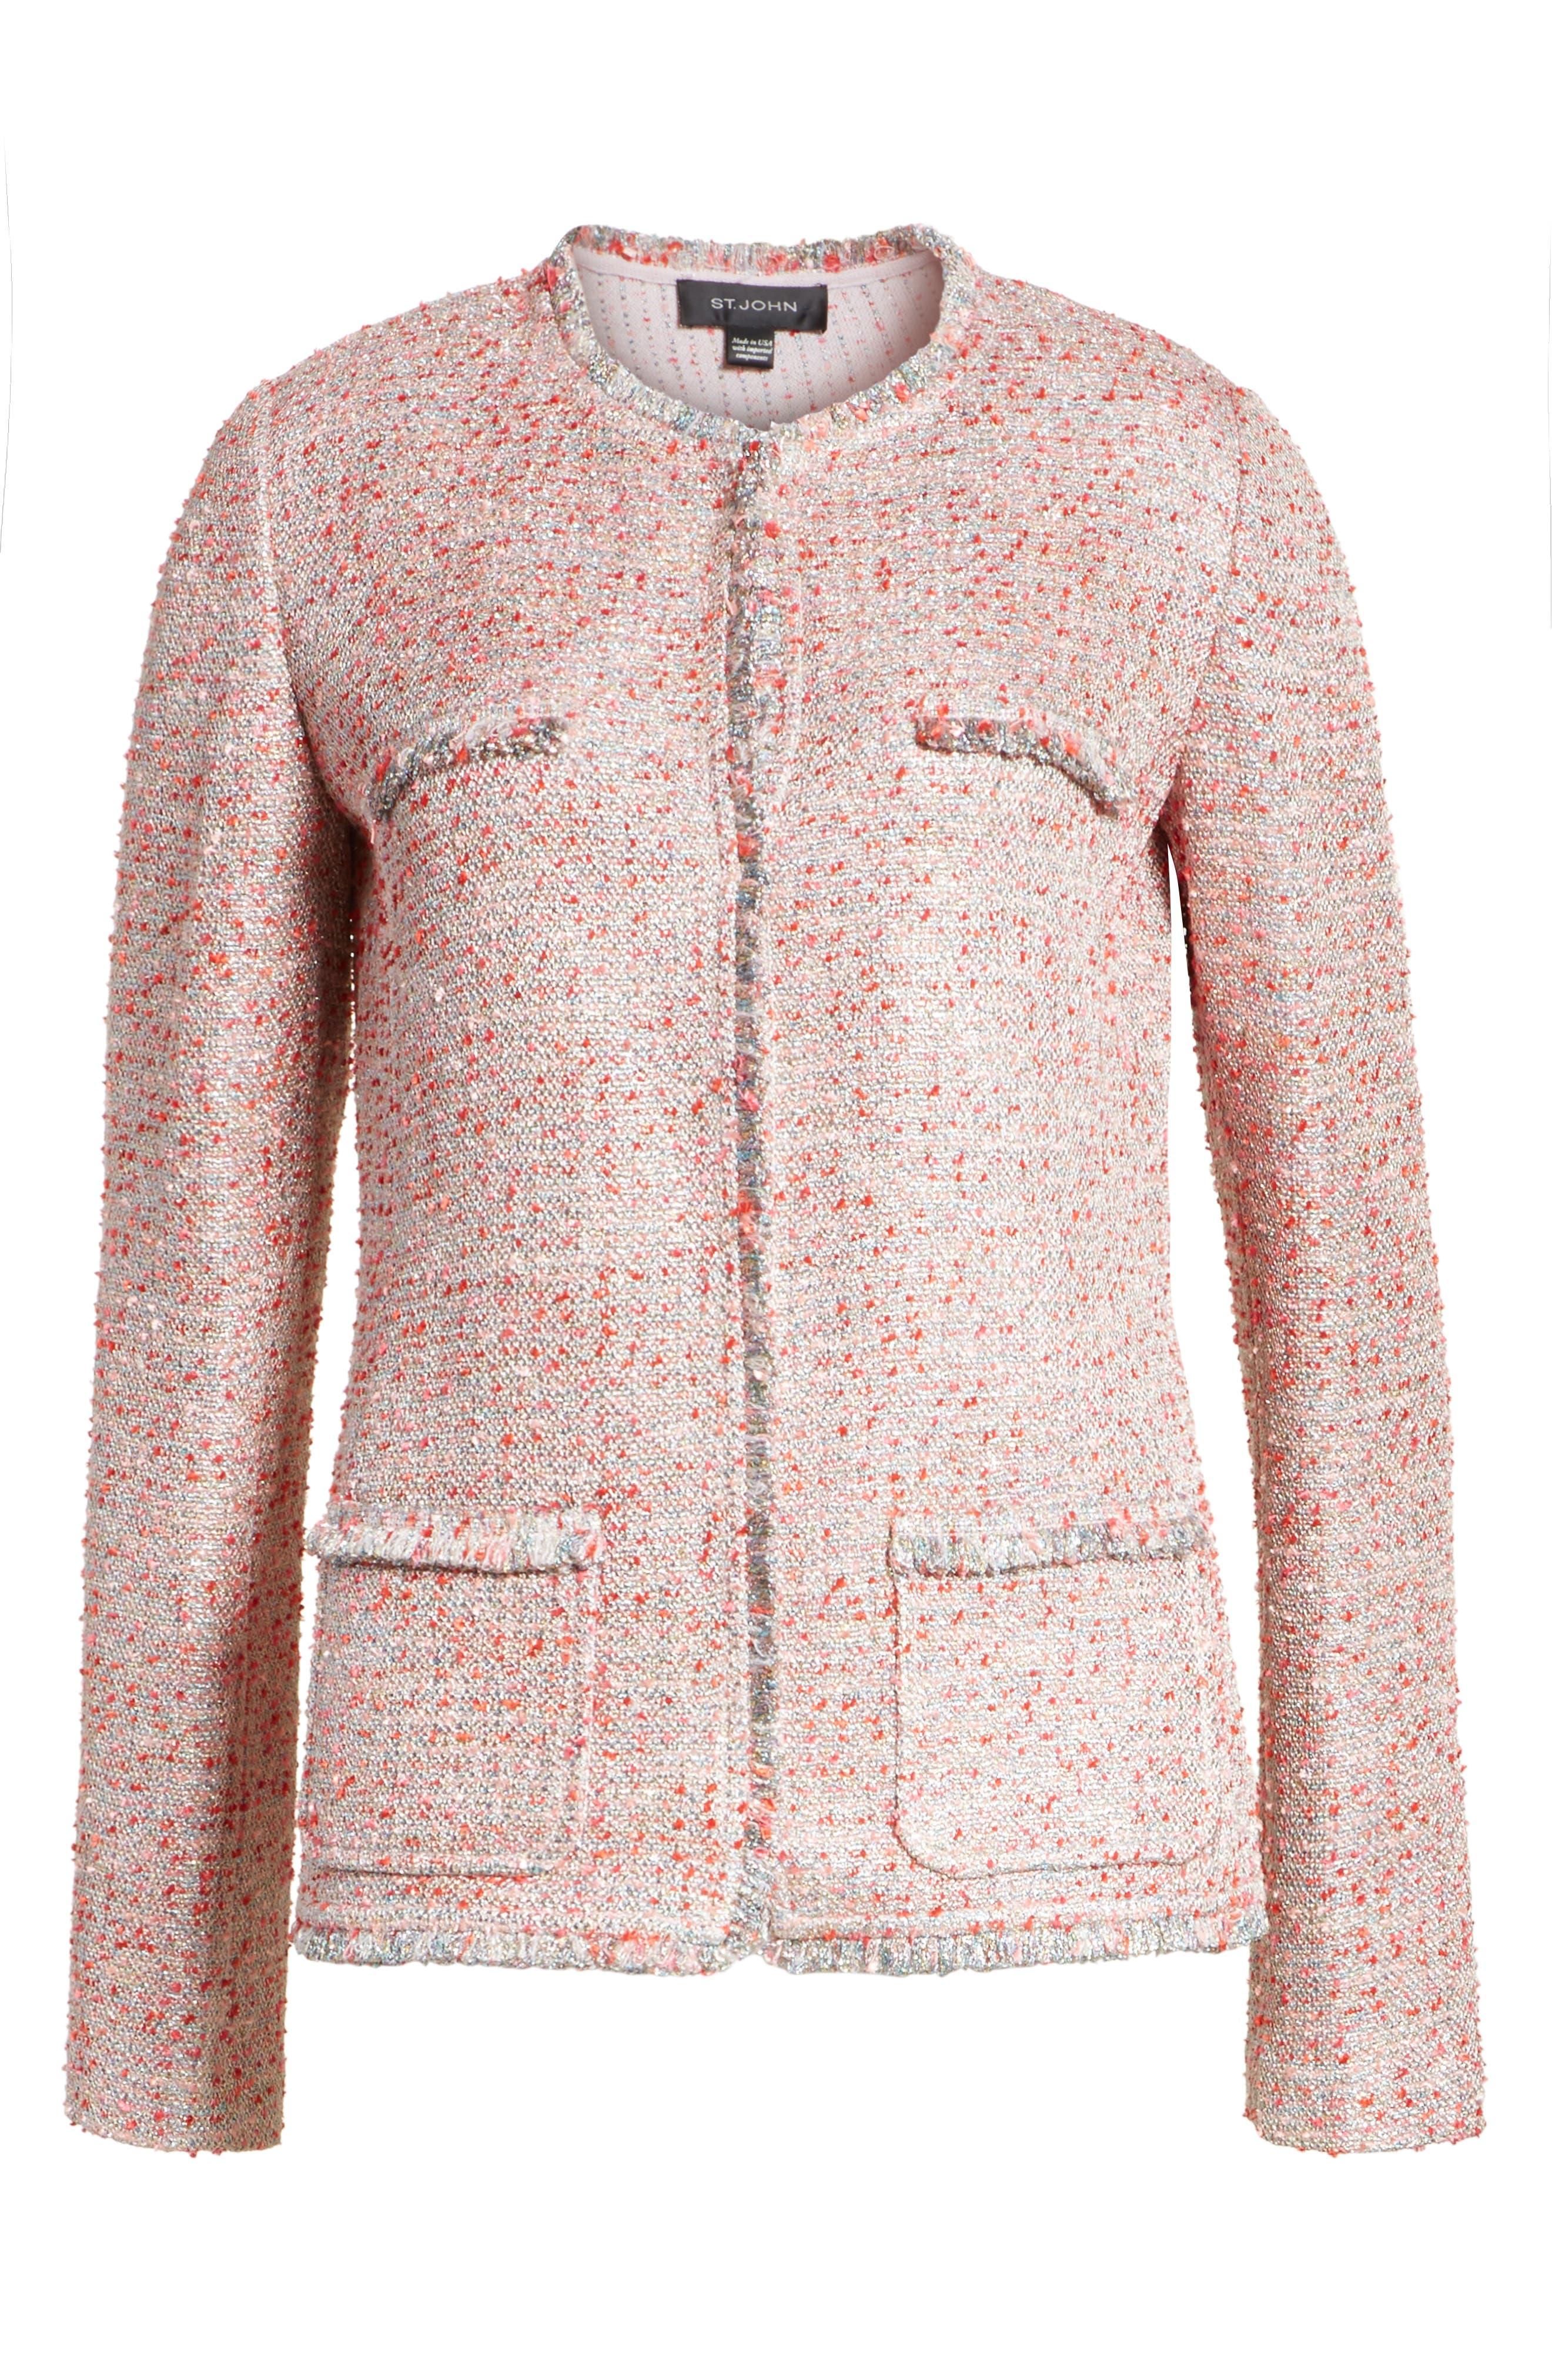 Metallic Tweed Jacket,                             Alternate thumbnail 5, color,                             660